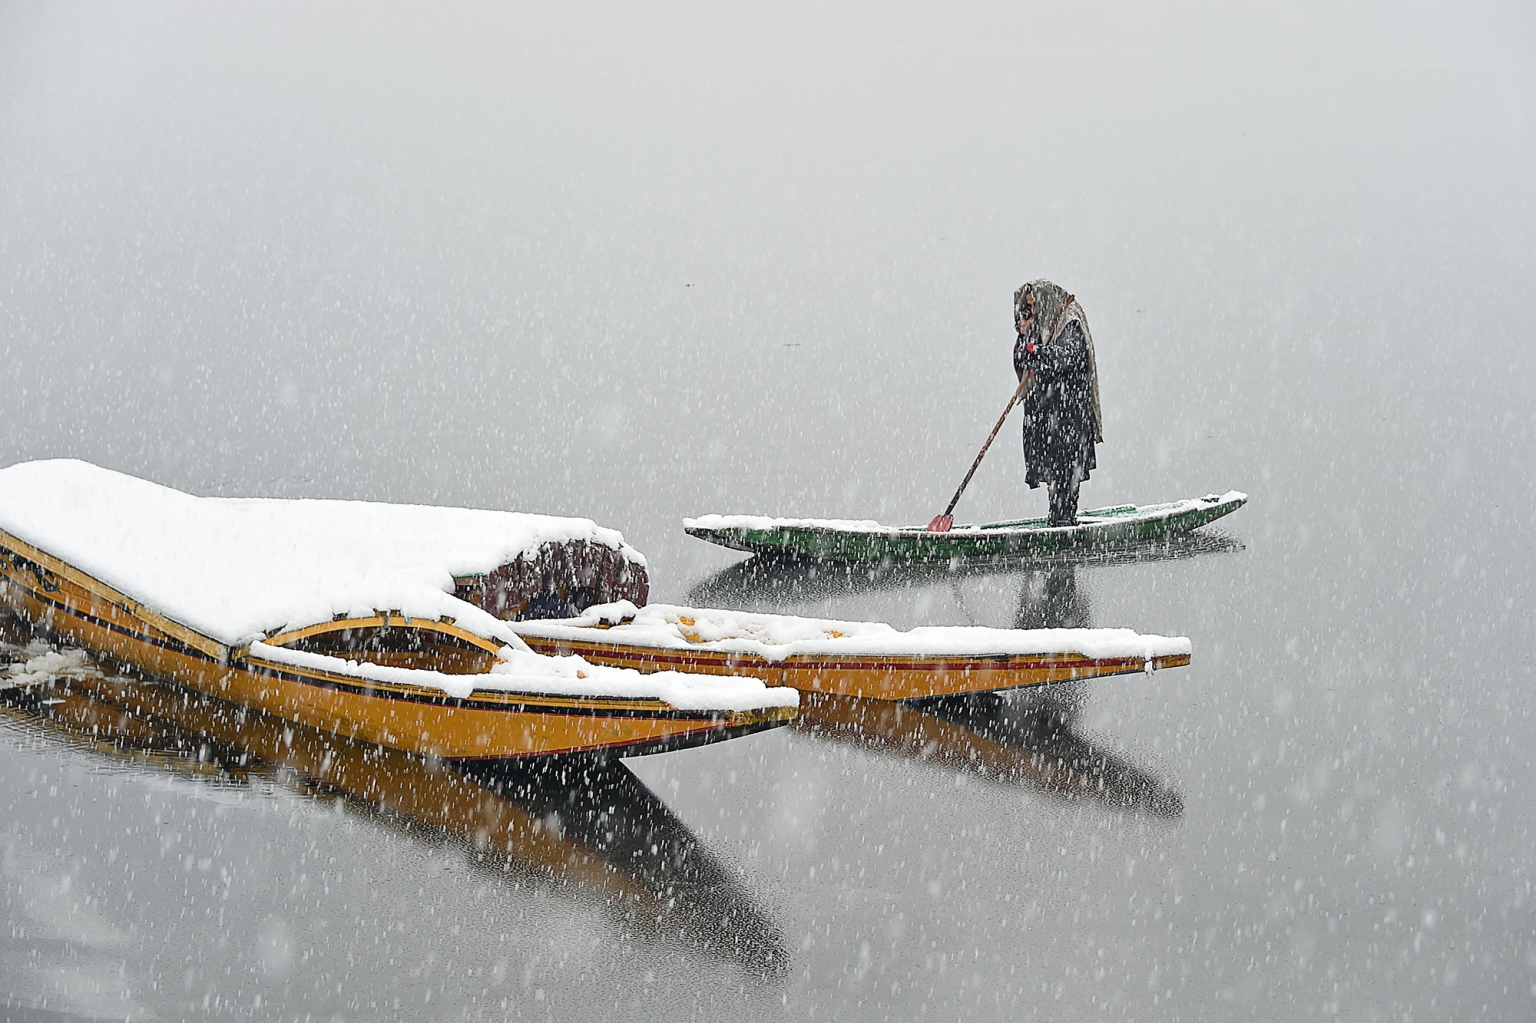 A Kashmiri boatman talks on a mobile phone during a snowfall at Dal Lake in Srinagar on Feb. 7. (Tauseef Mustafa/AFP/Getty Images)